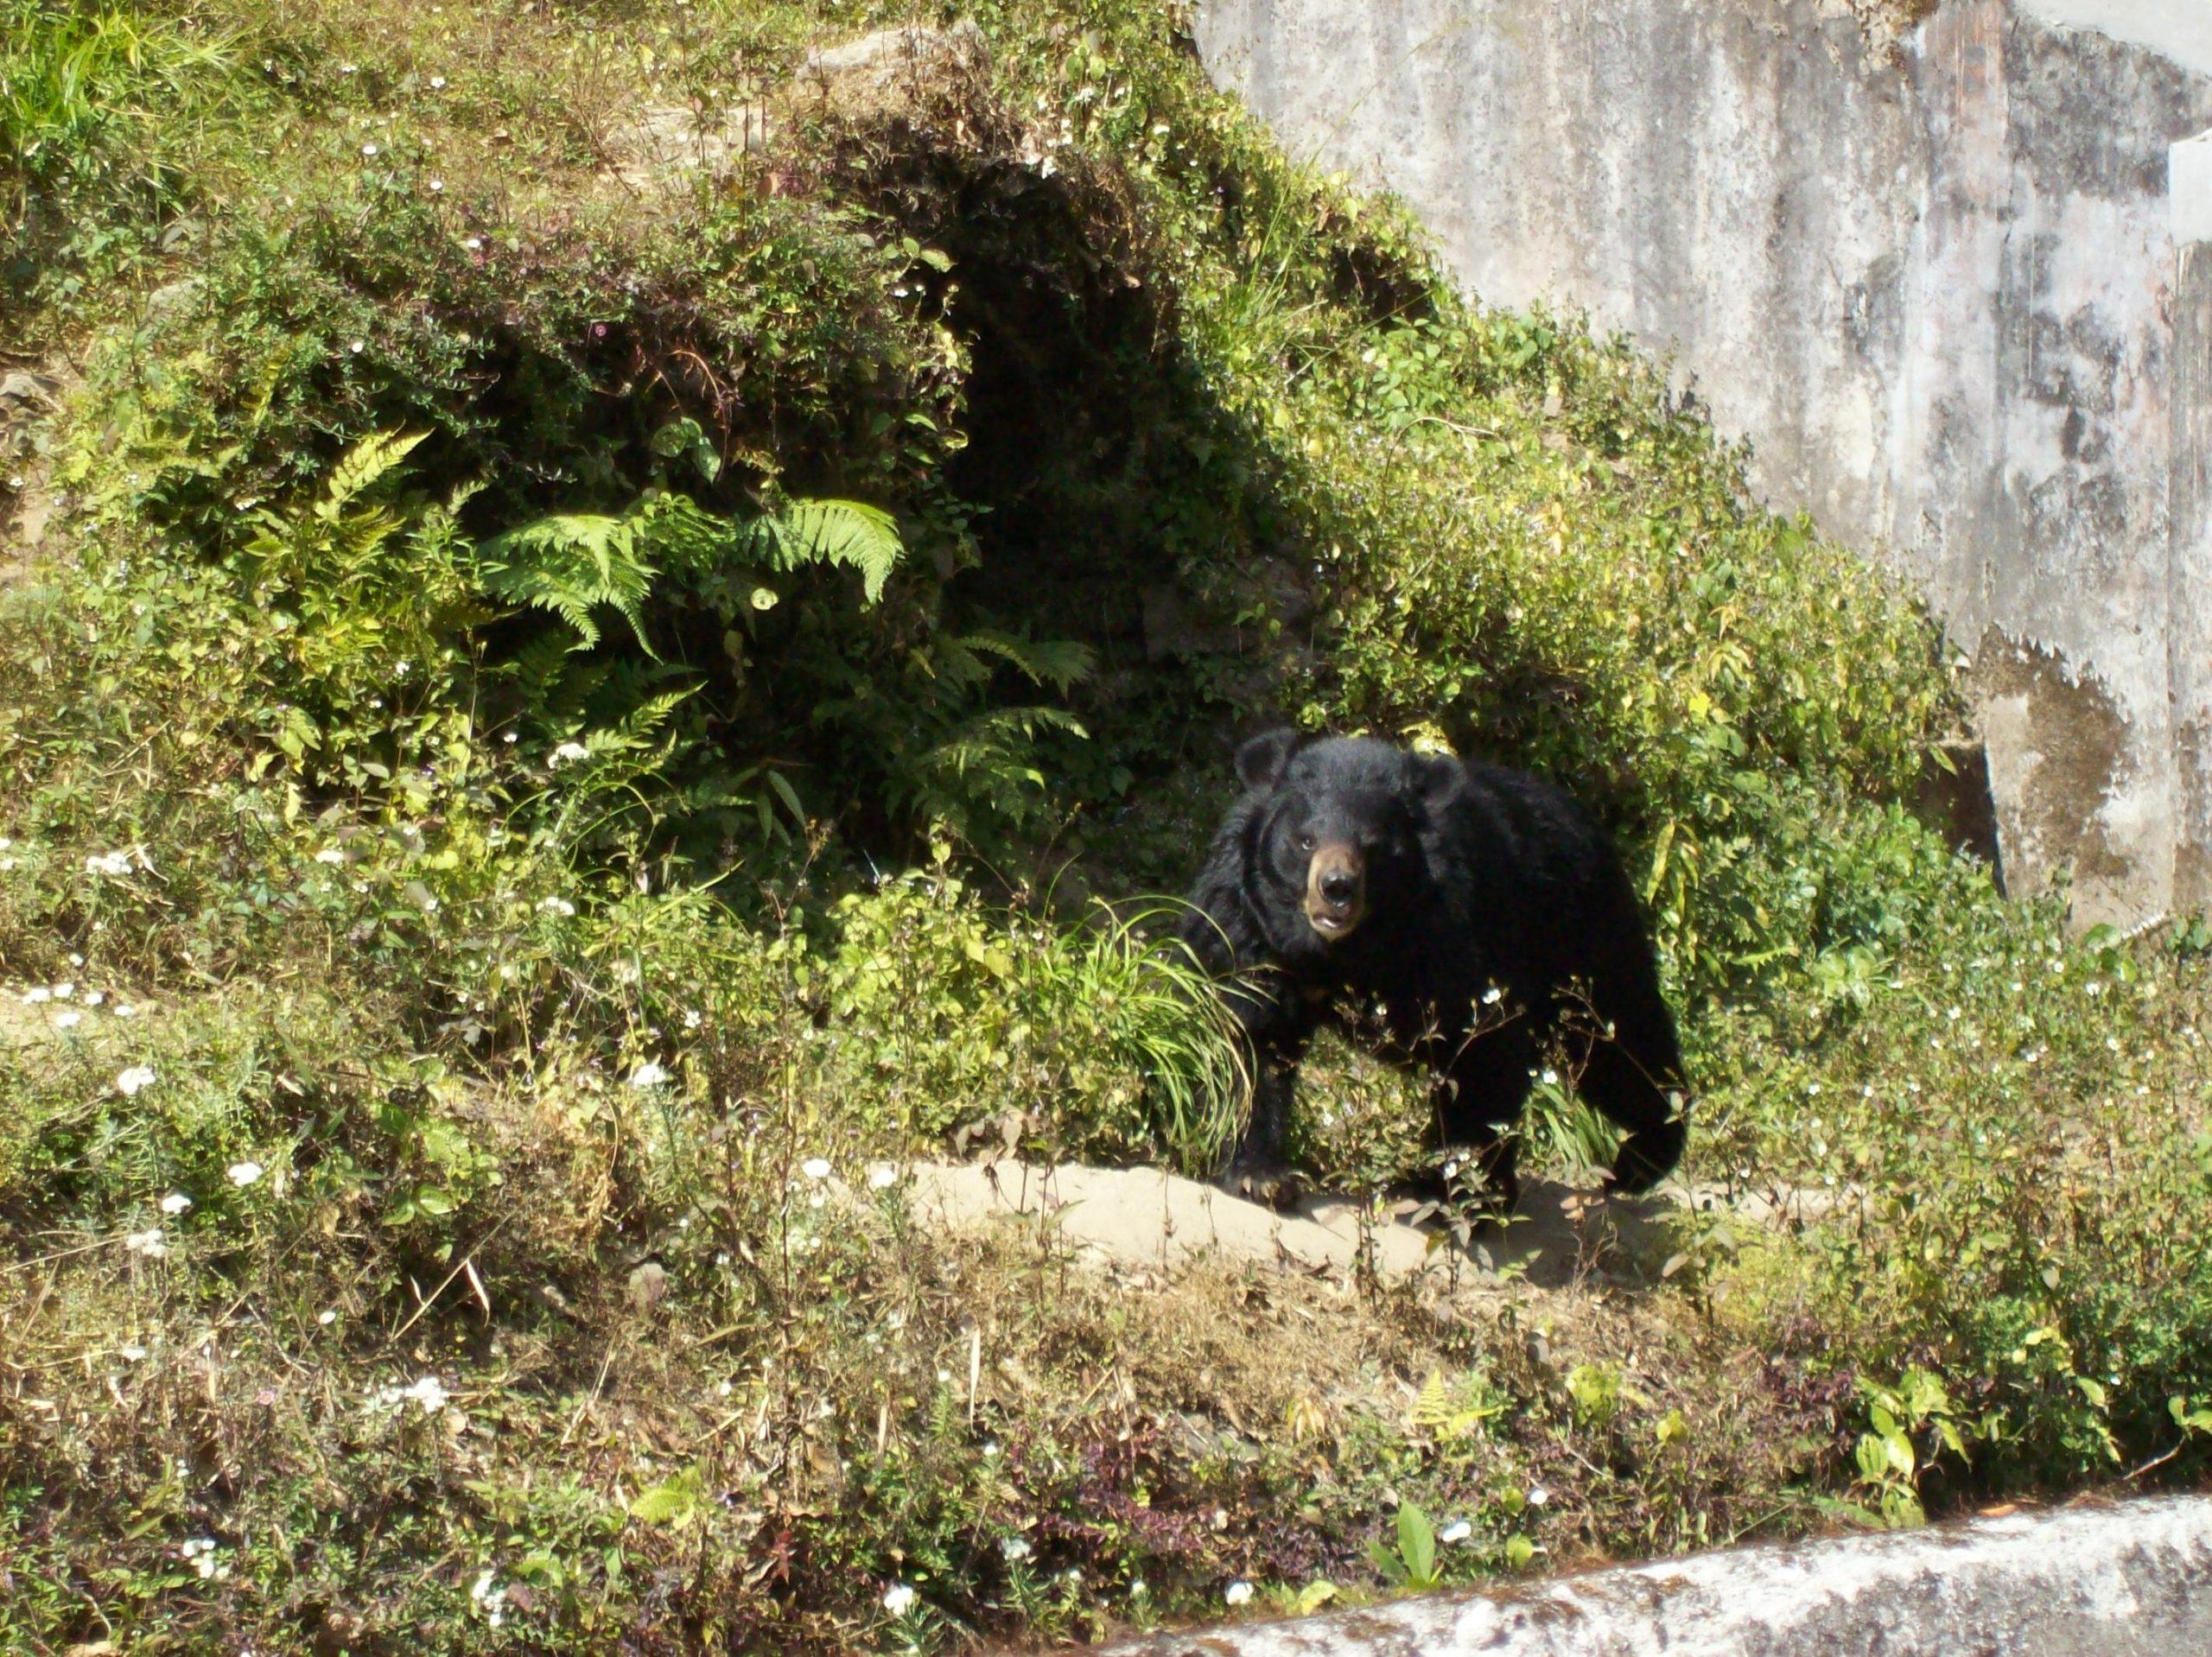 A bear at Darjeeling Zoo